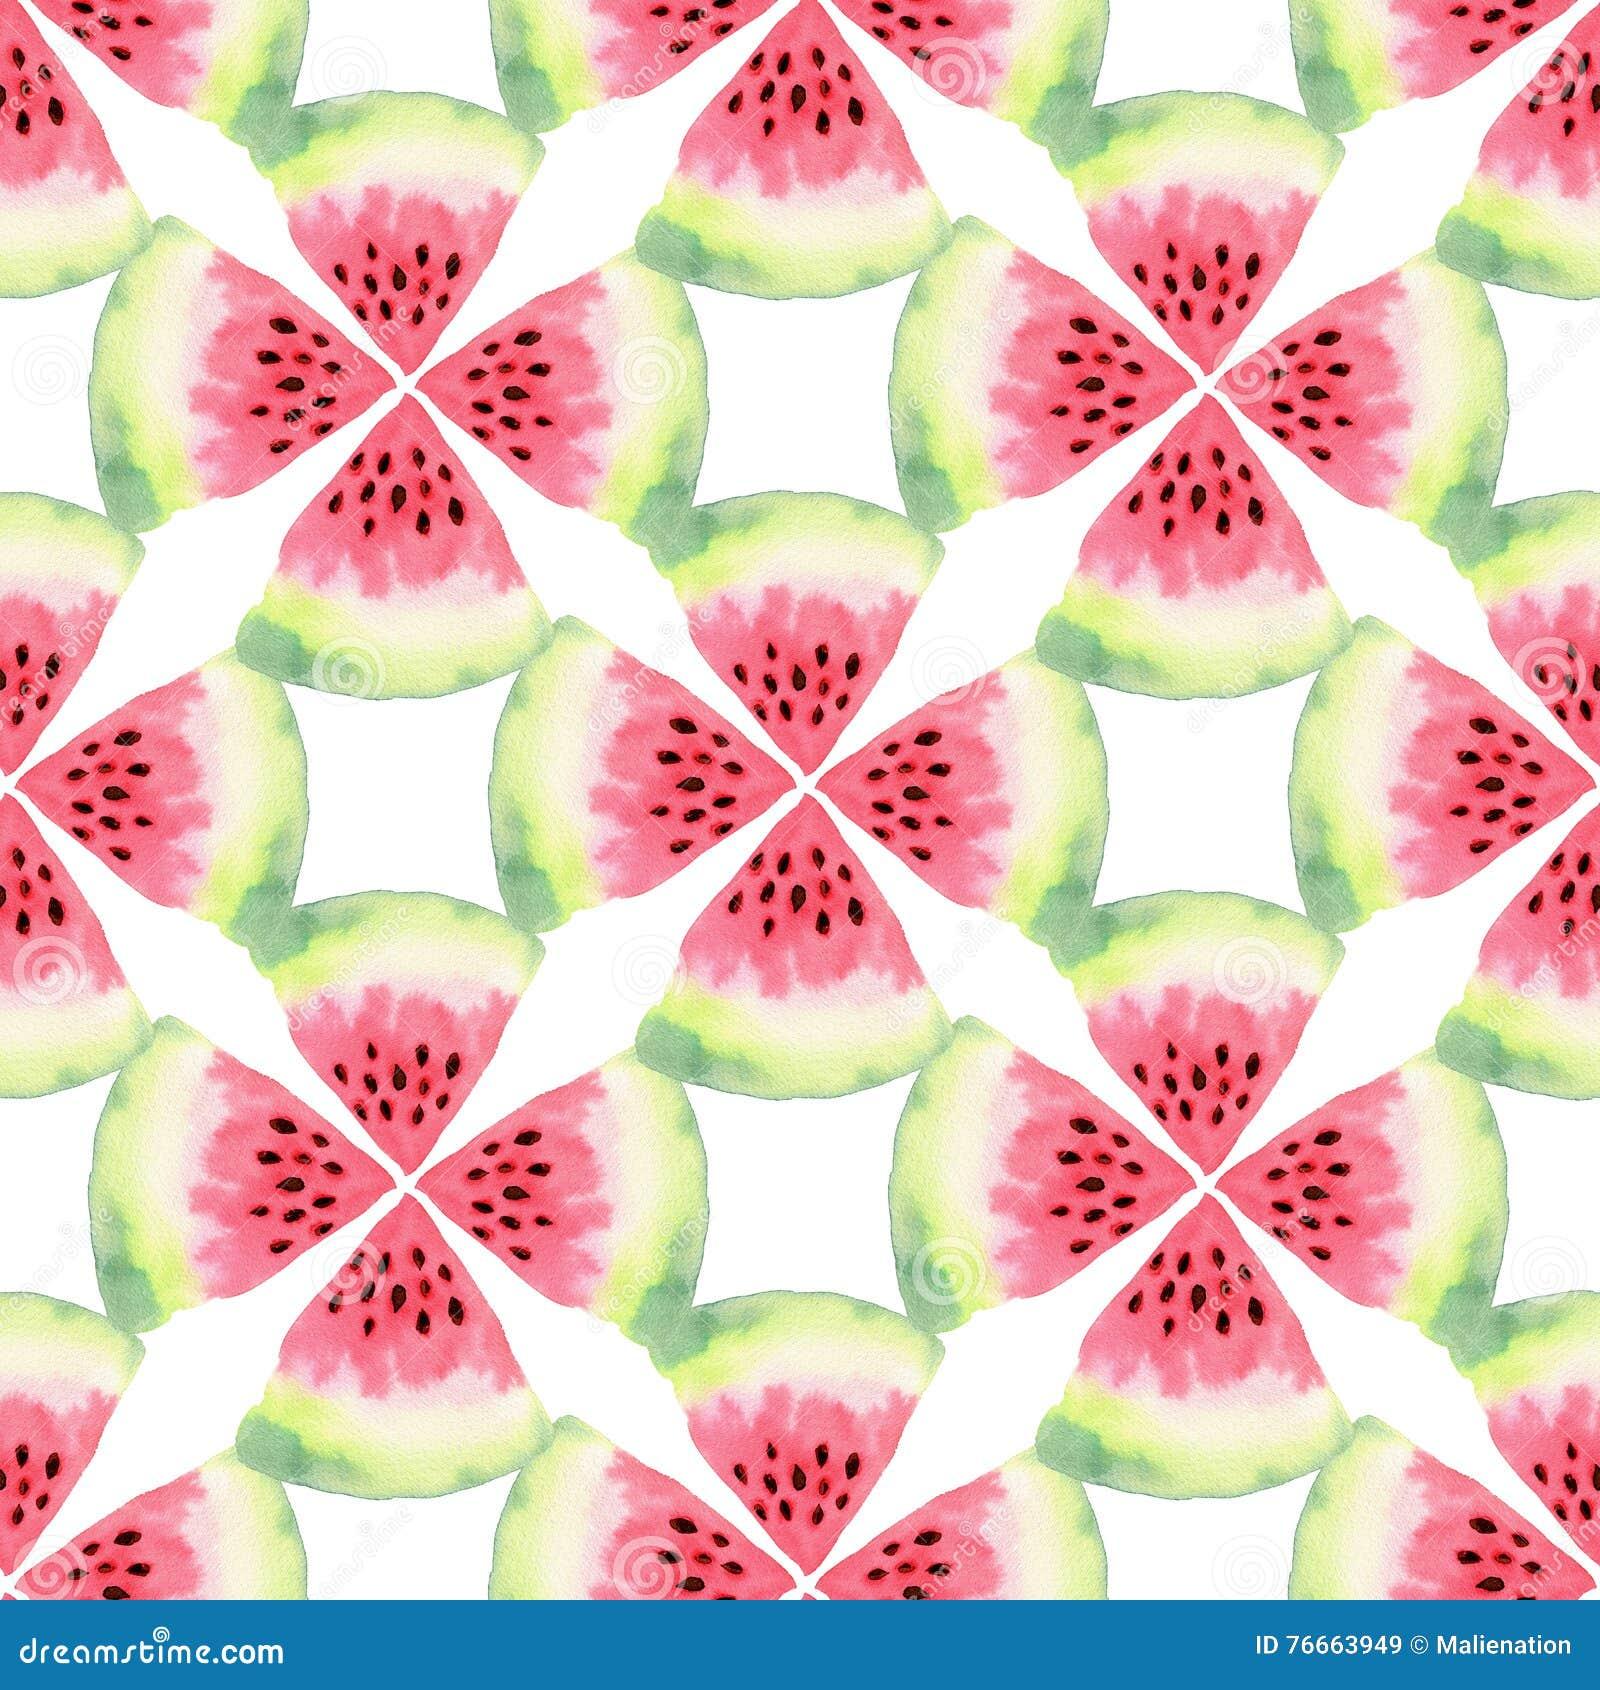 Watermelon watercolor seamless pattern. Modern food illustration. Textile print design